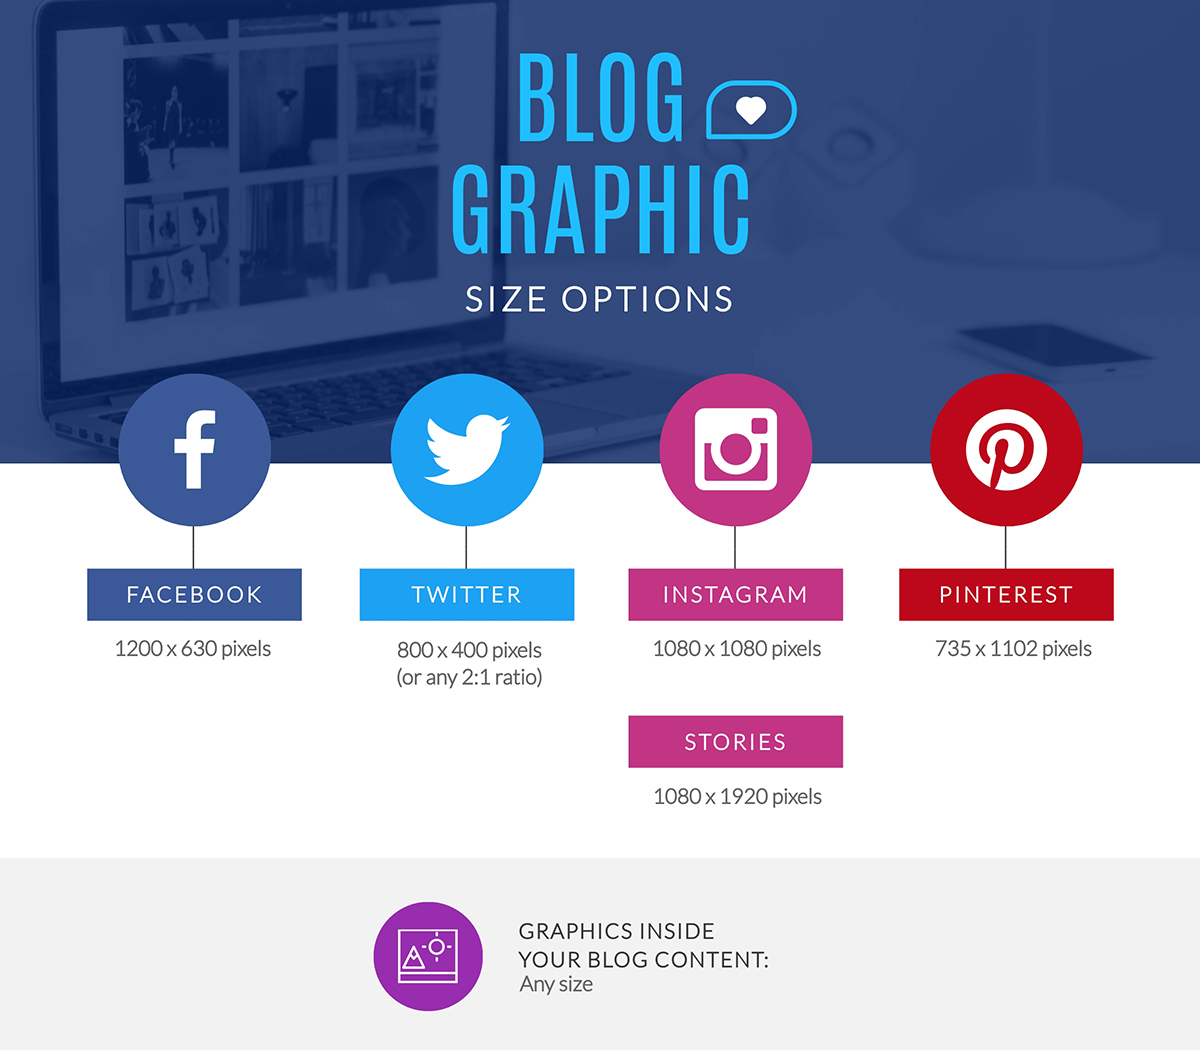 blog graphics sizes infographic